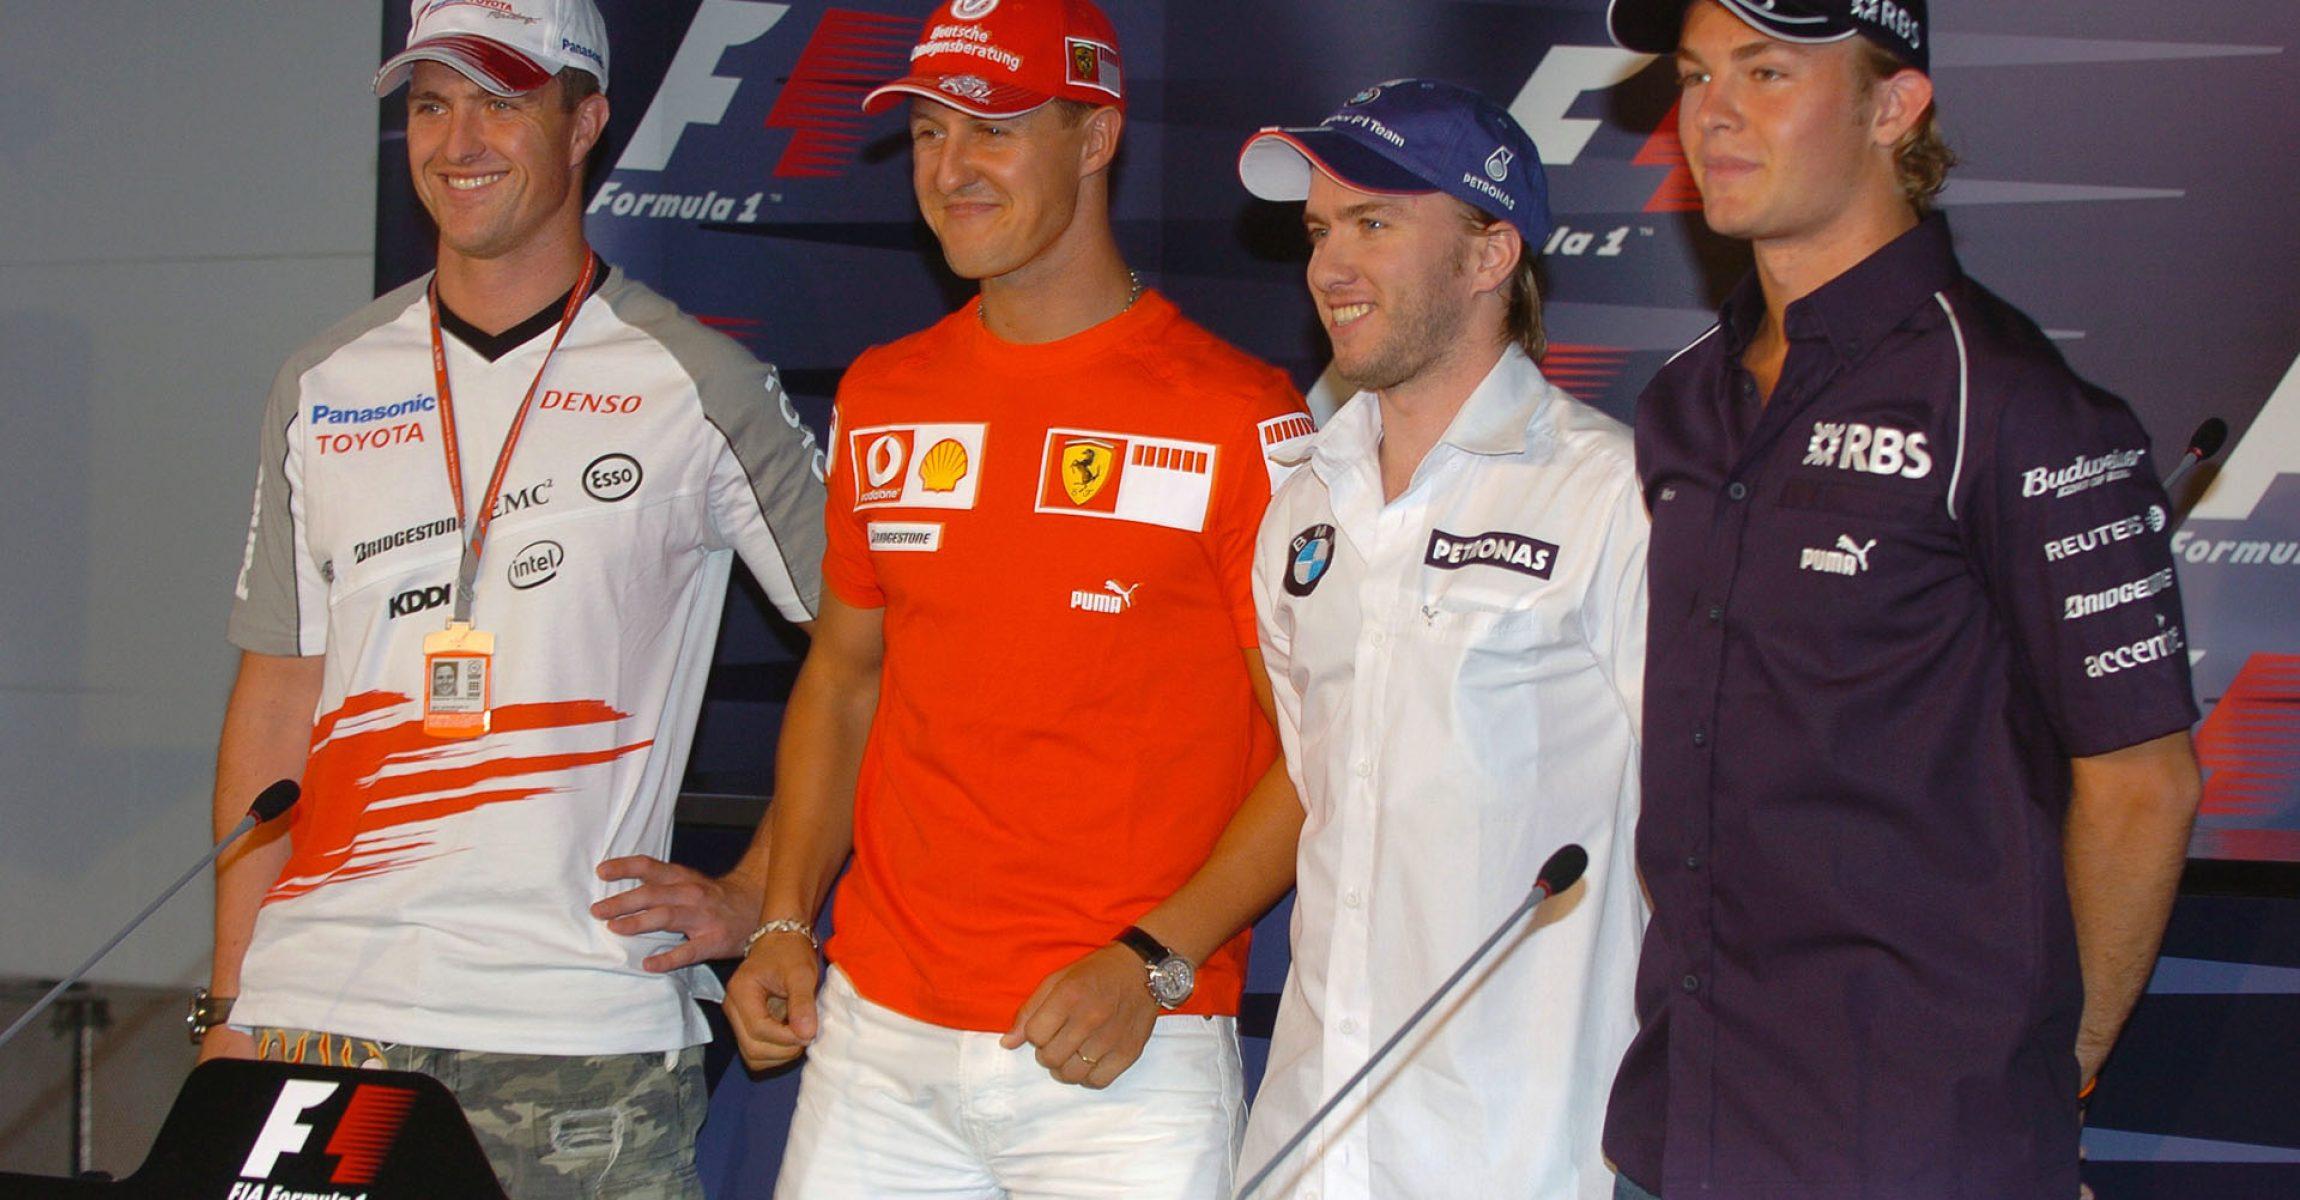 Ralf Schumacher, Michael Schumacher,  Nick Heidfeld BMW Sauber F1 Team Driver 2006 and Nico Rosberg.attend the Thursday Press conference.